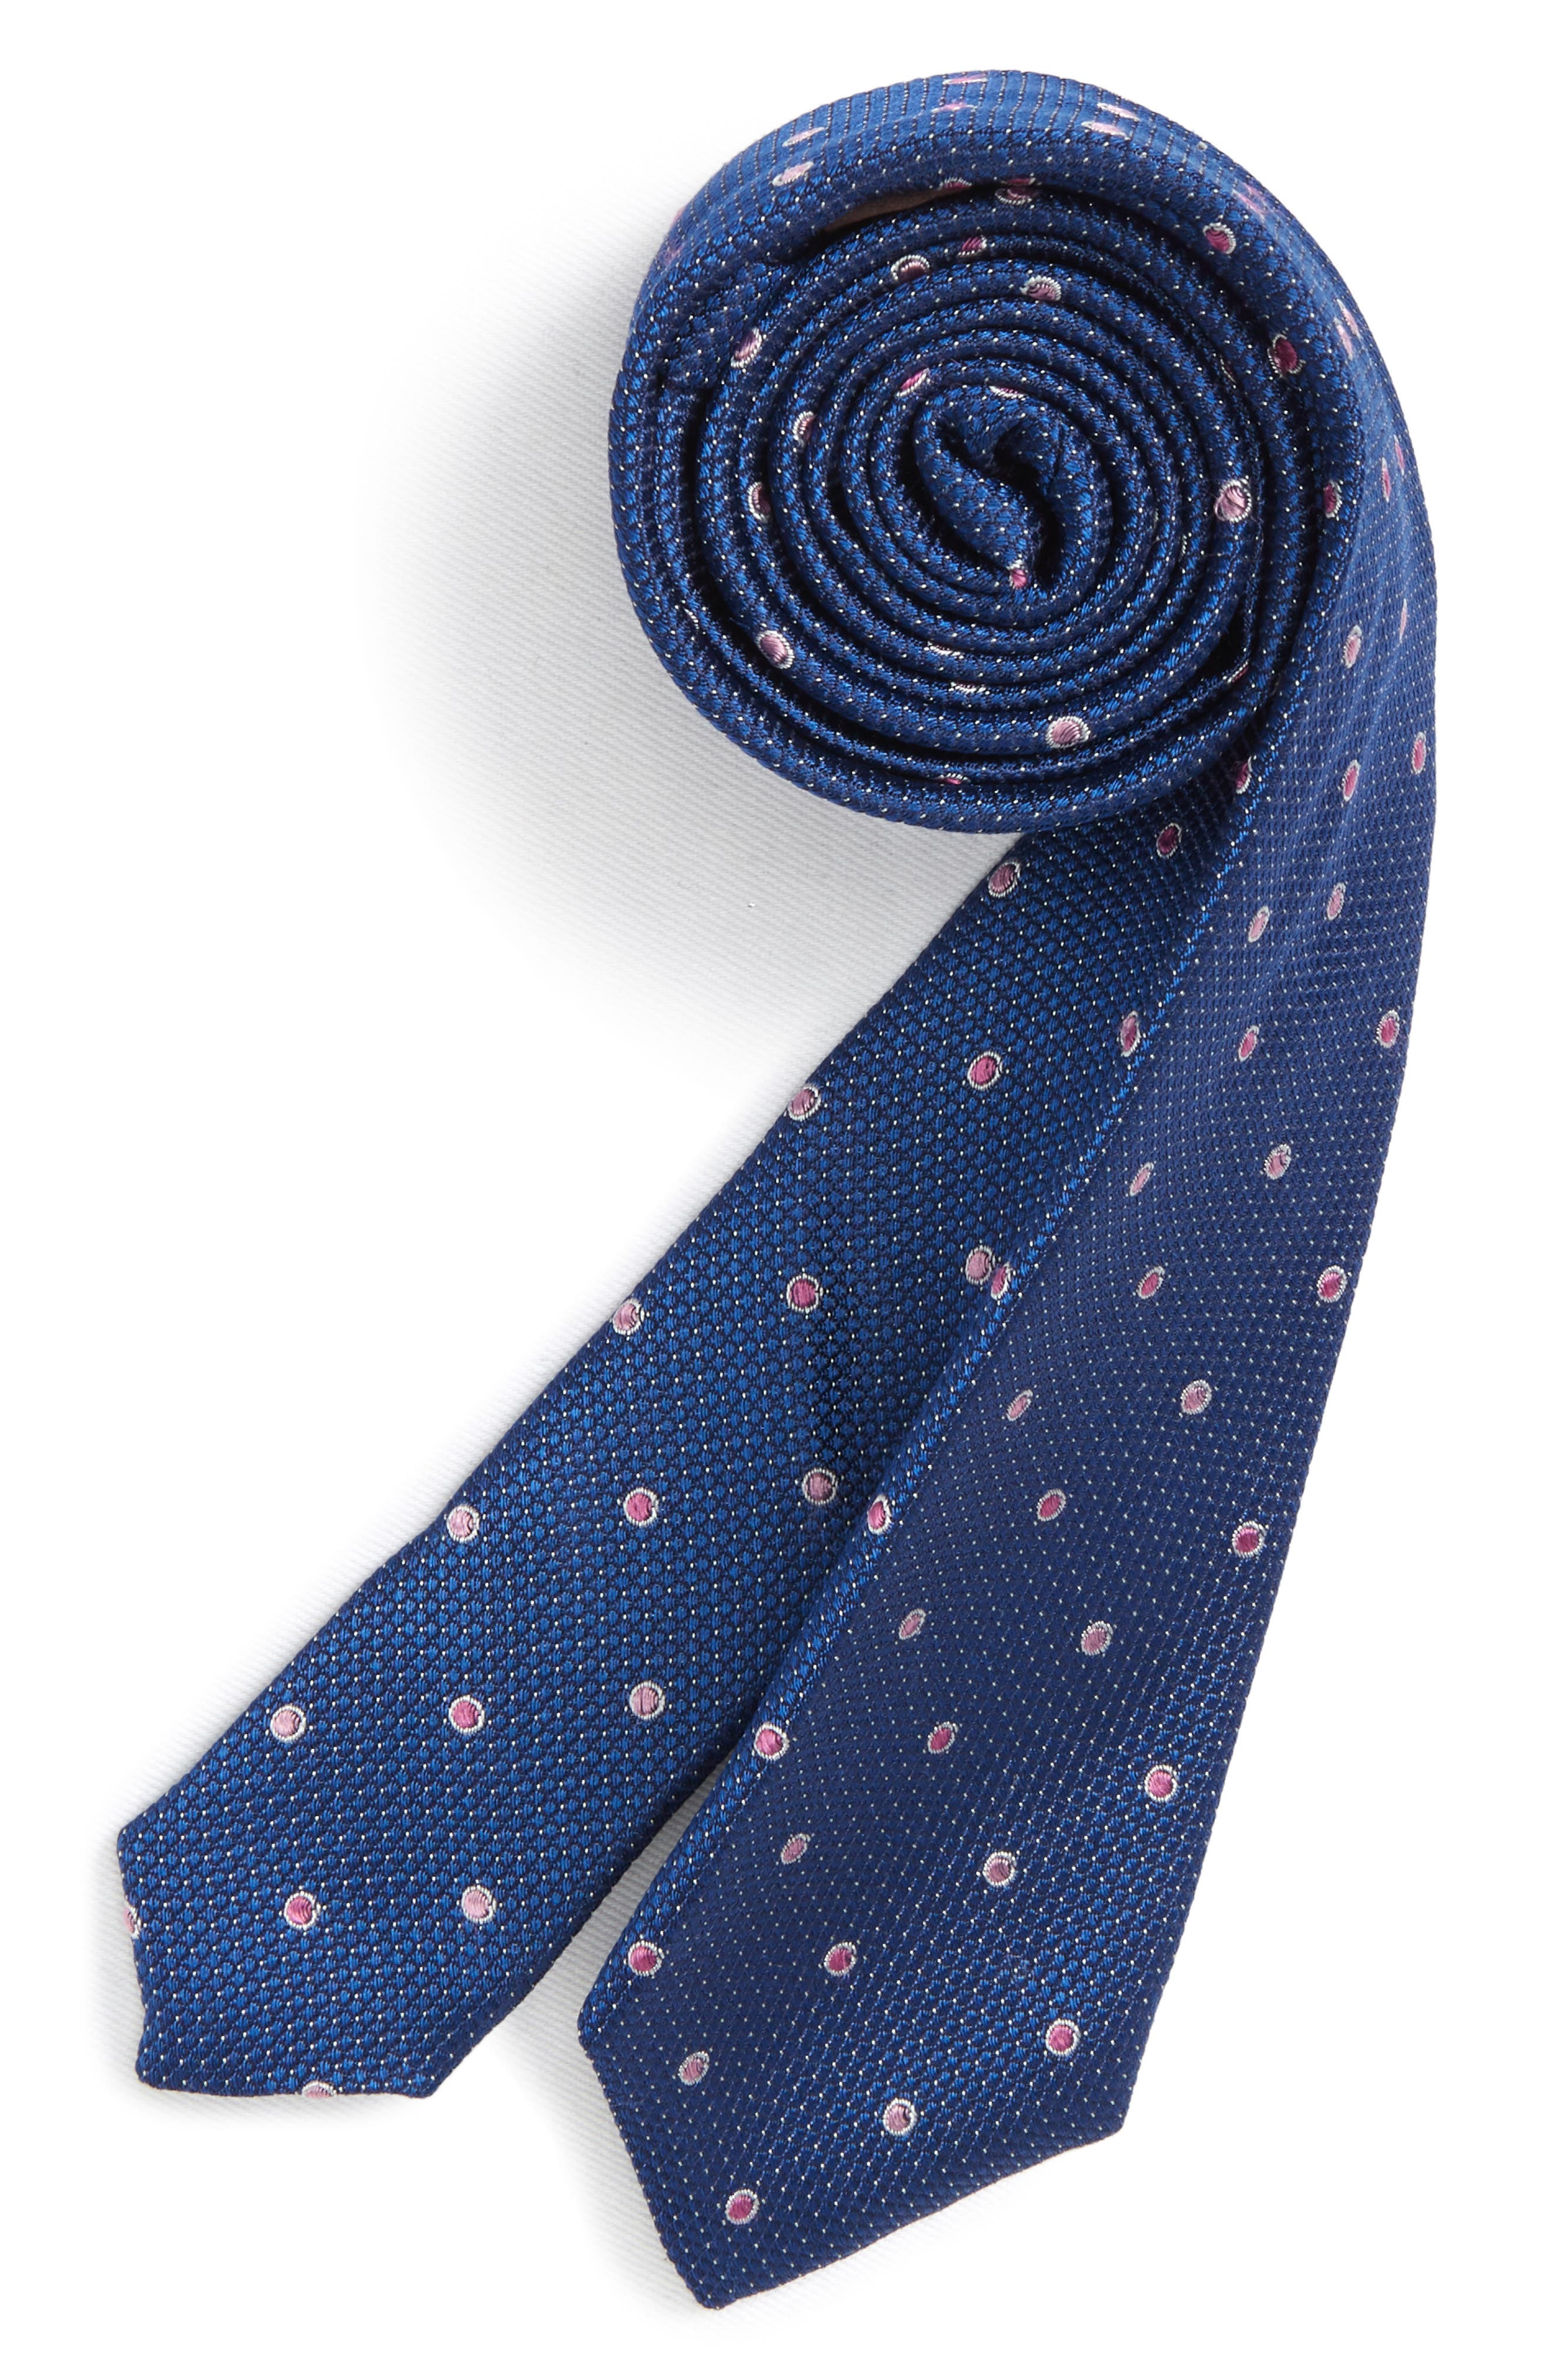 MICHAEL KORS,                             Dot Print Silk Tie,                             Main thumbnail 1, color,                             400